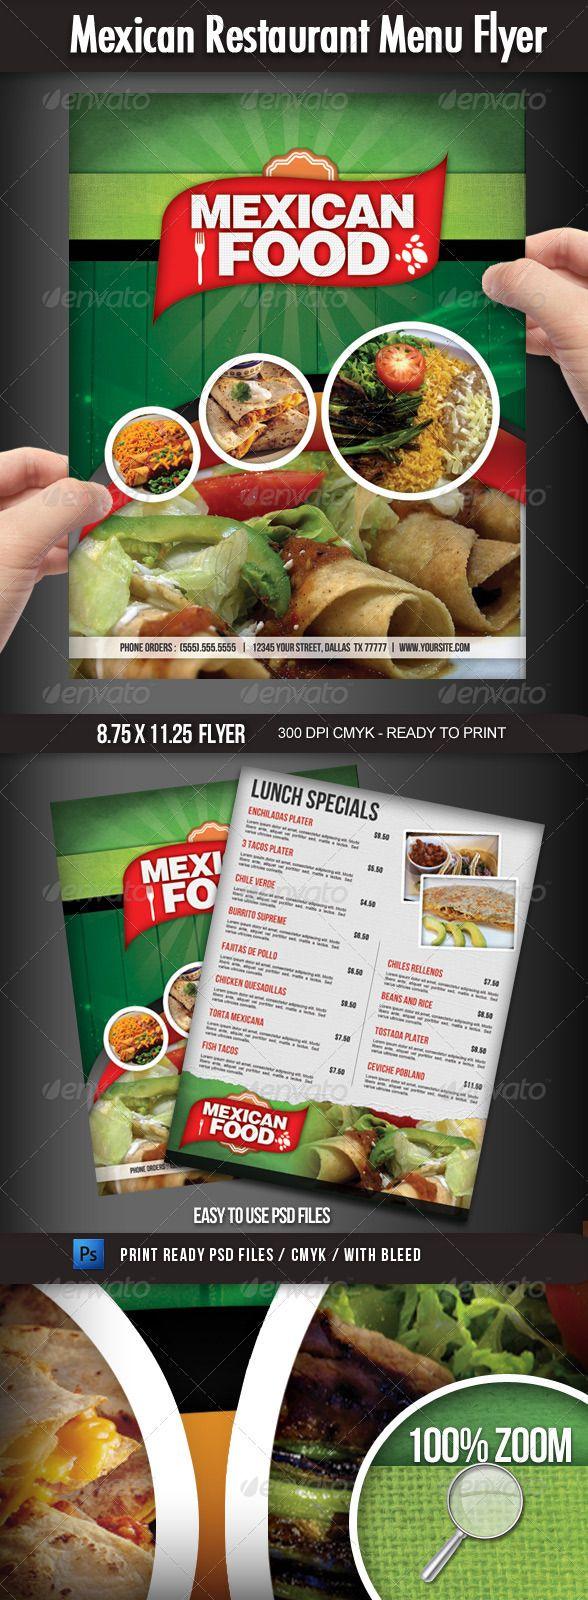 Restaurant Brochure Templates microsoft word greeting card template – Restaurant Brochure Templates